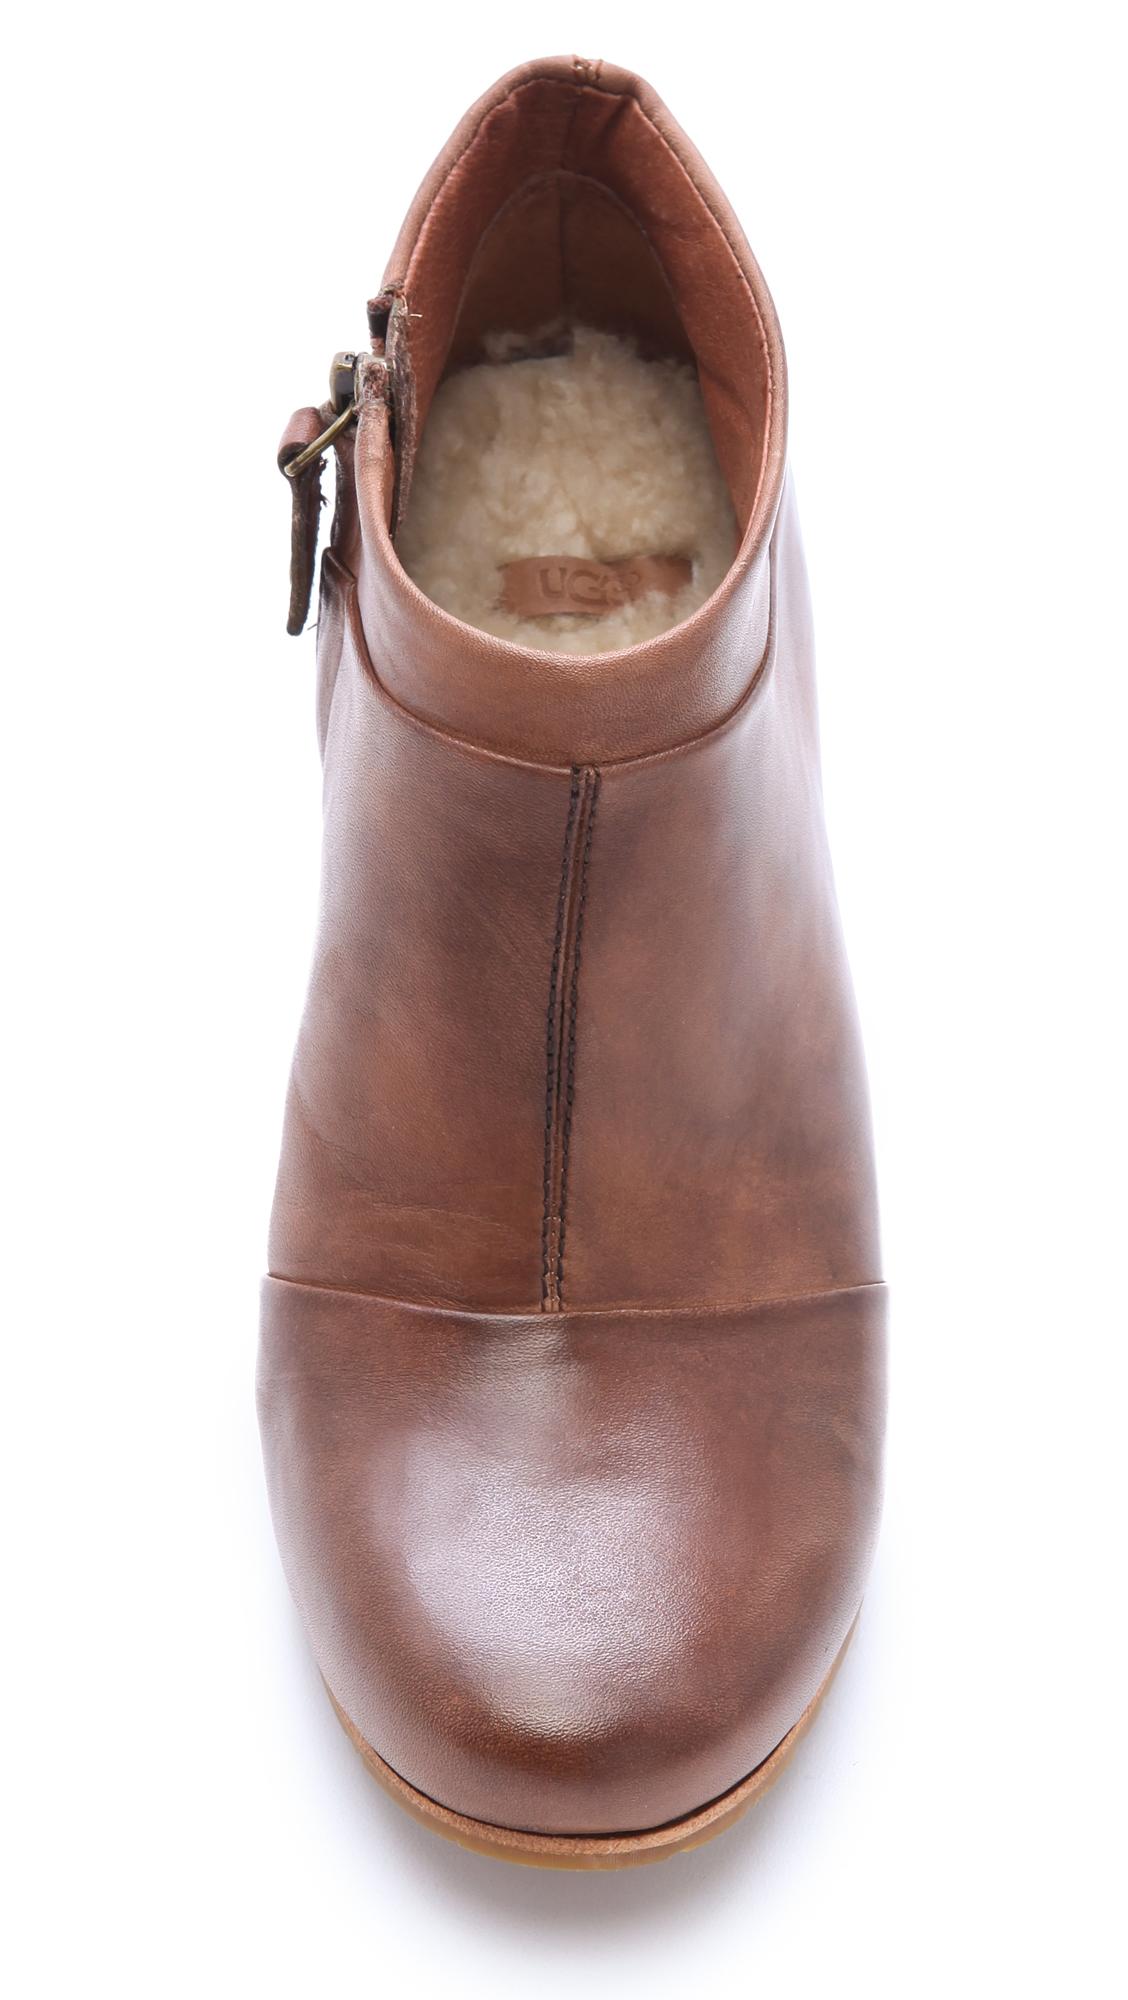 1f312433e95 UGG Australia Carmine Wedge Booties